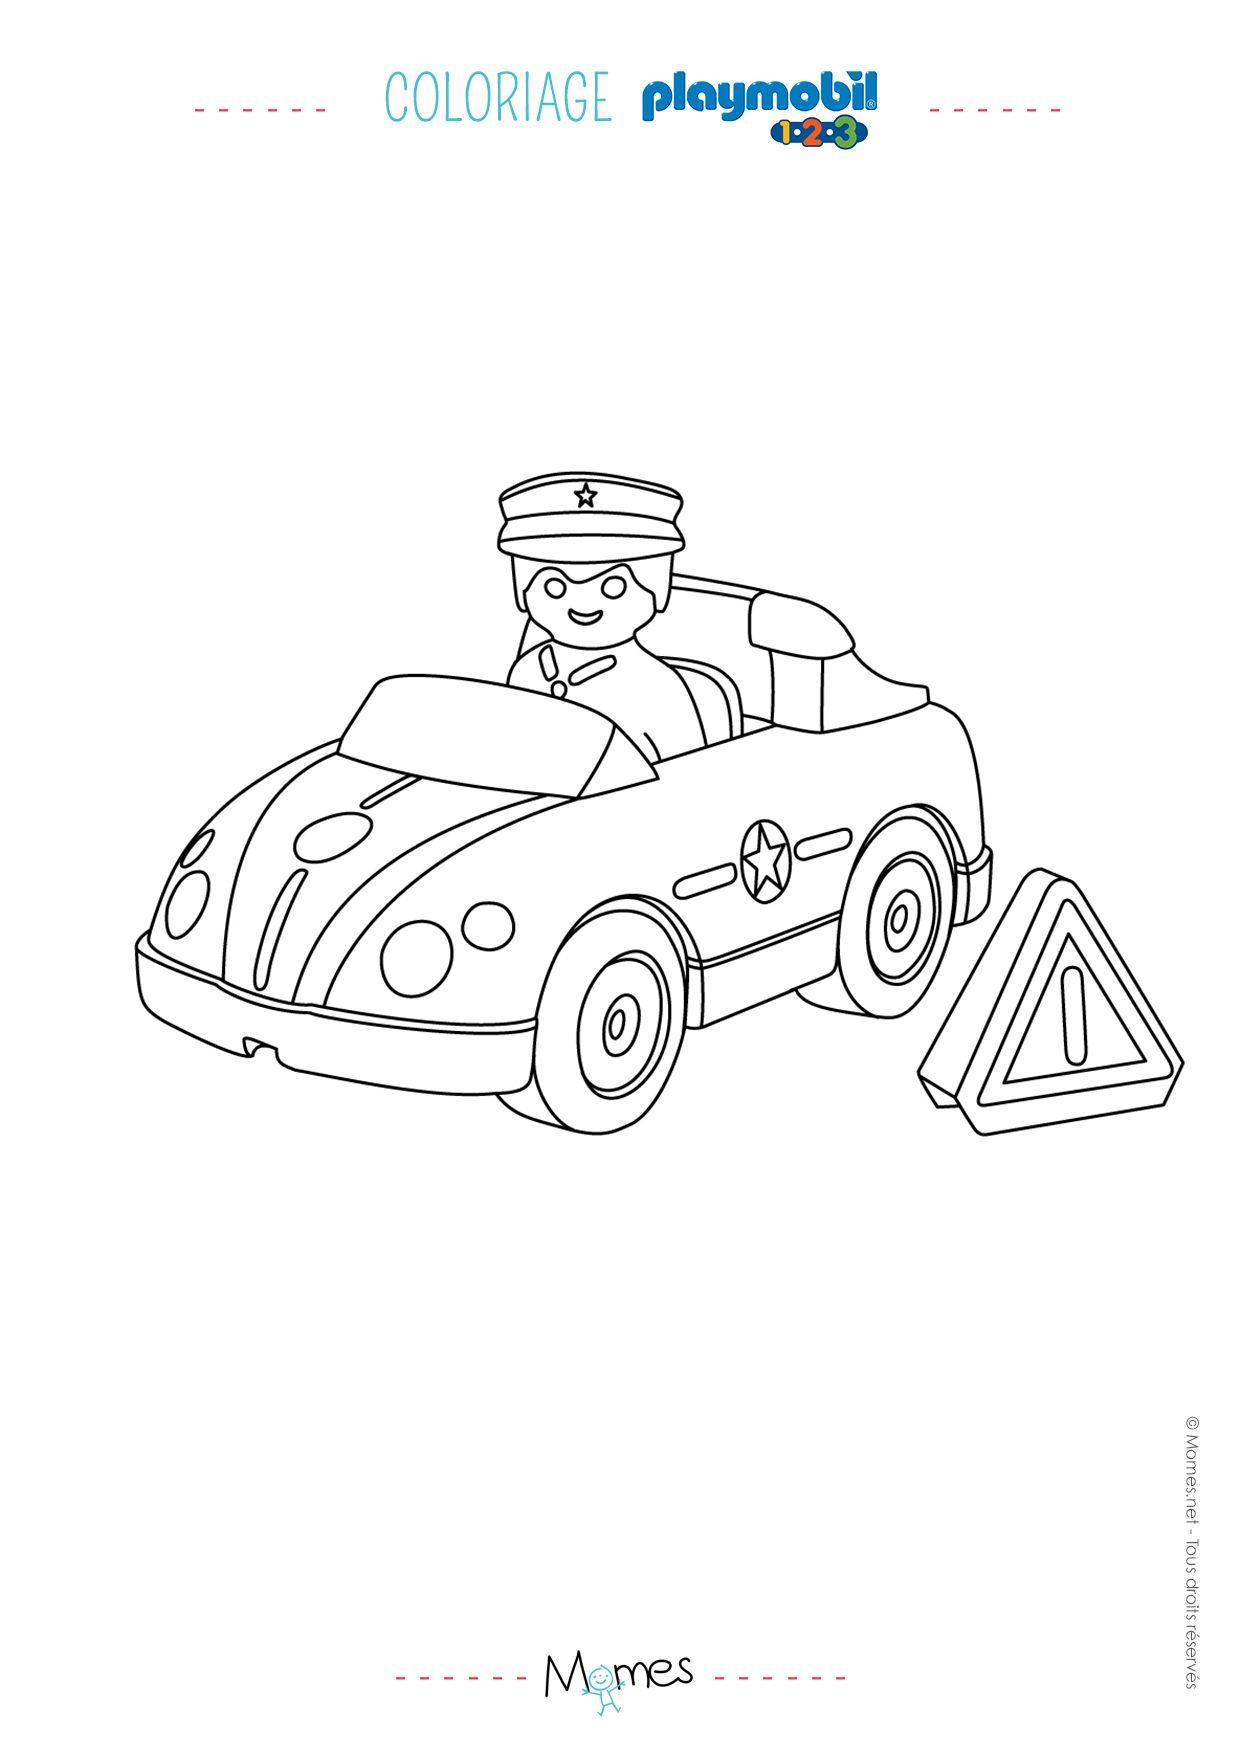 Coloriage la voiture de police et le policier playmobil 123 playmobil coloriage playmobil - Dessin voiture de police ...